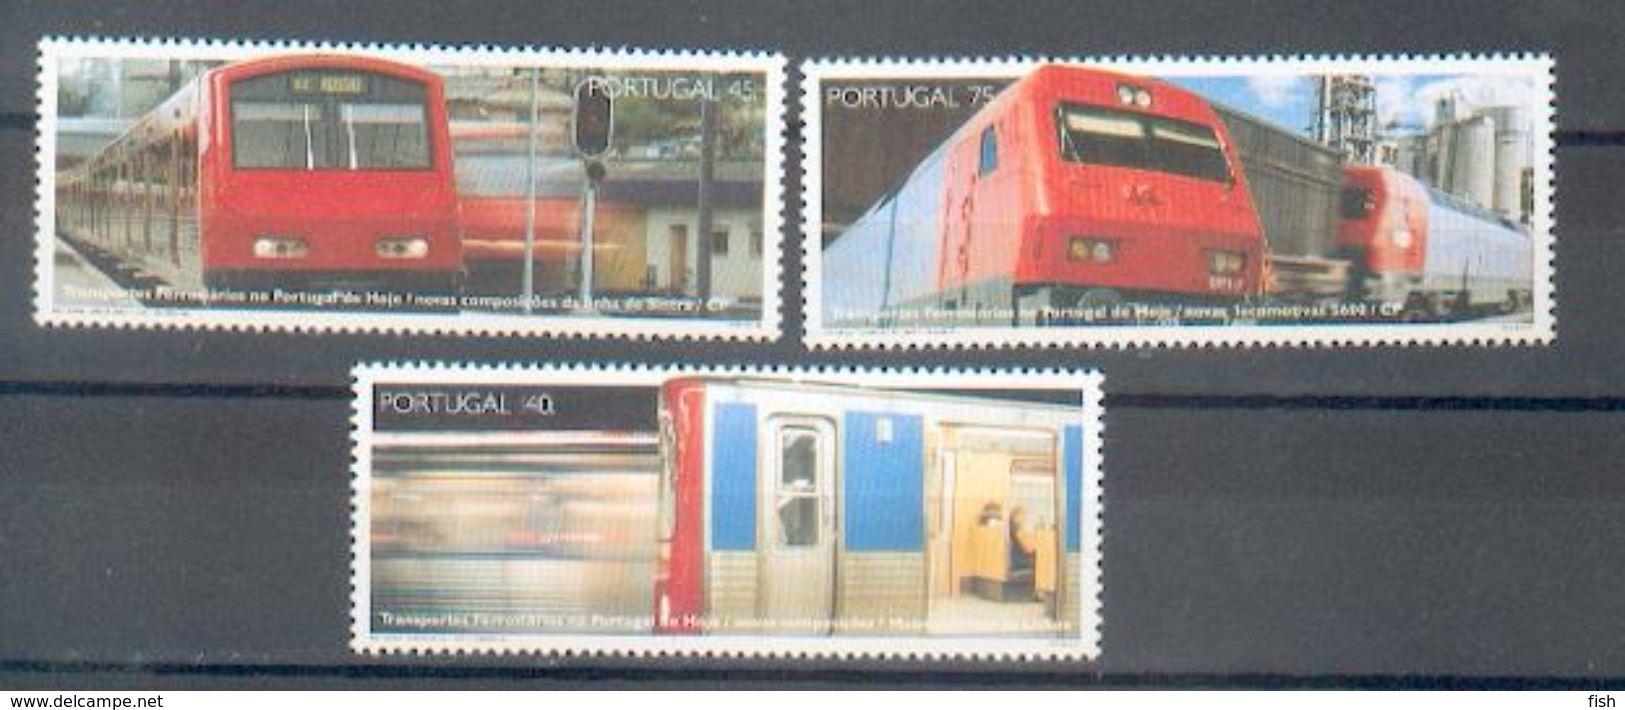 Portugal ** & Railroad Transportation 1994 (2246) - Trains